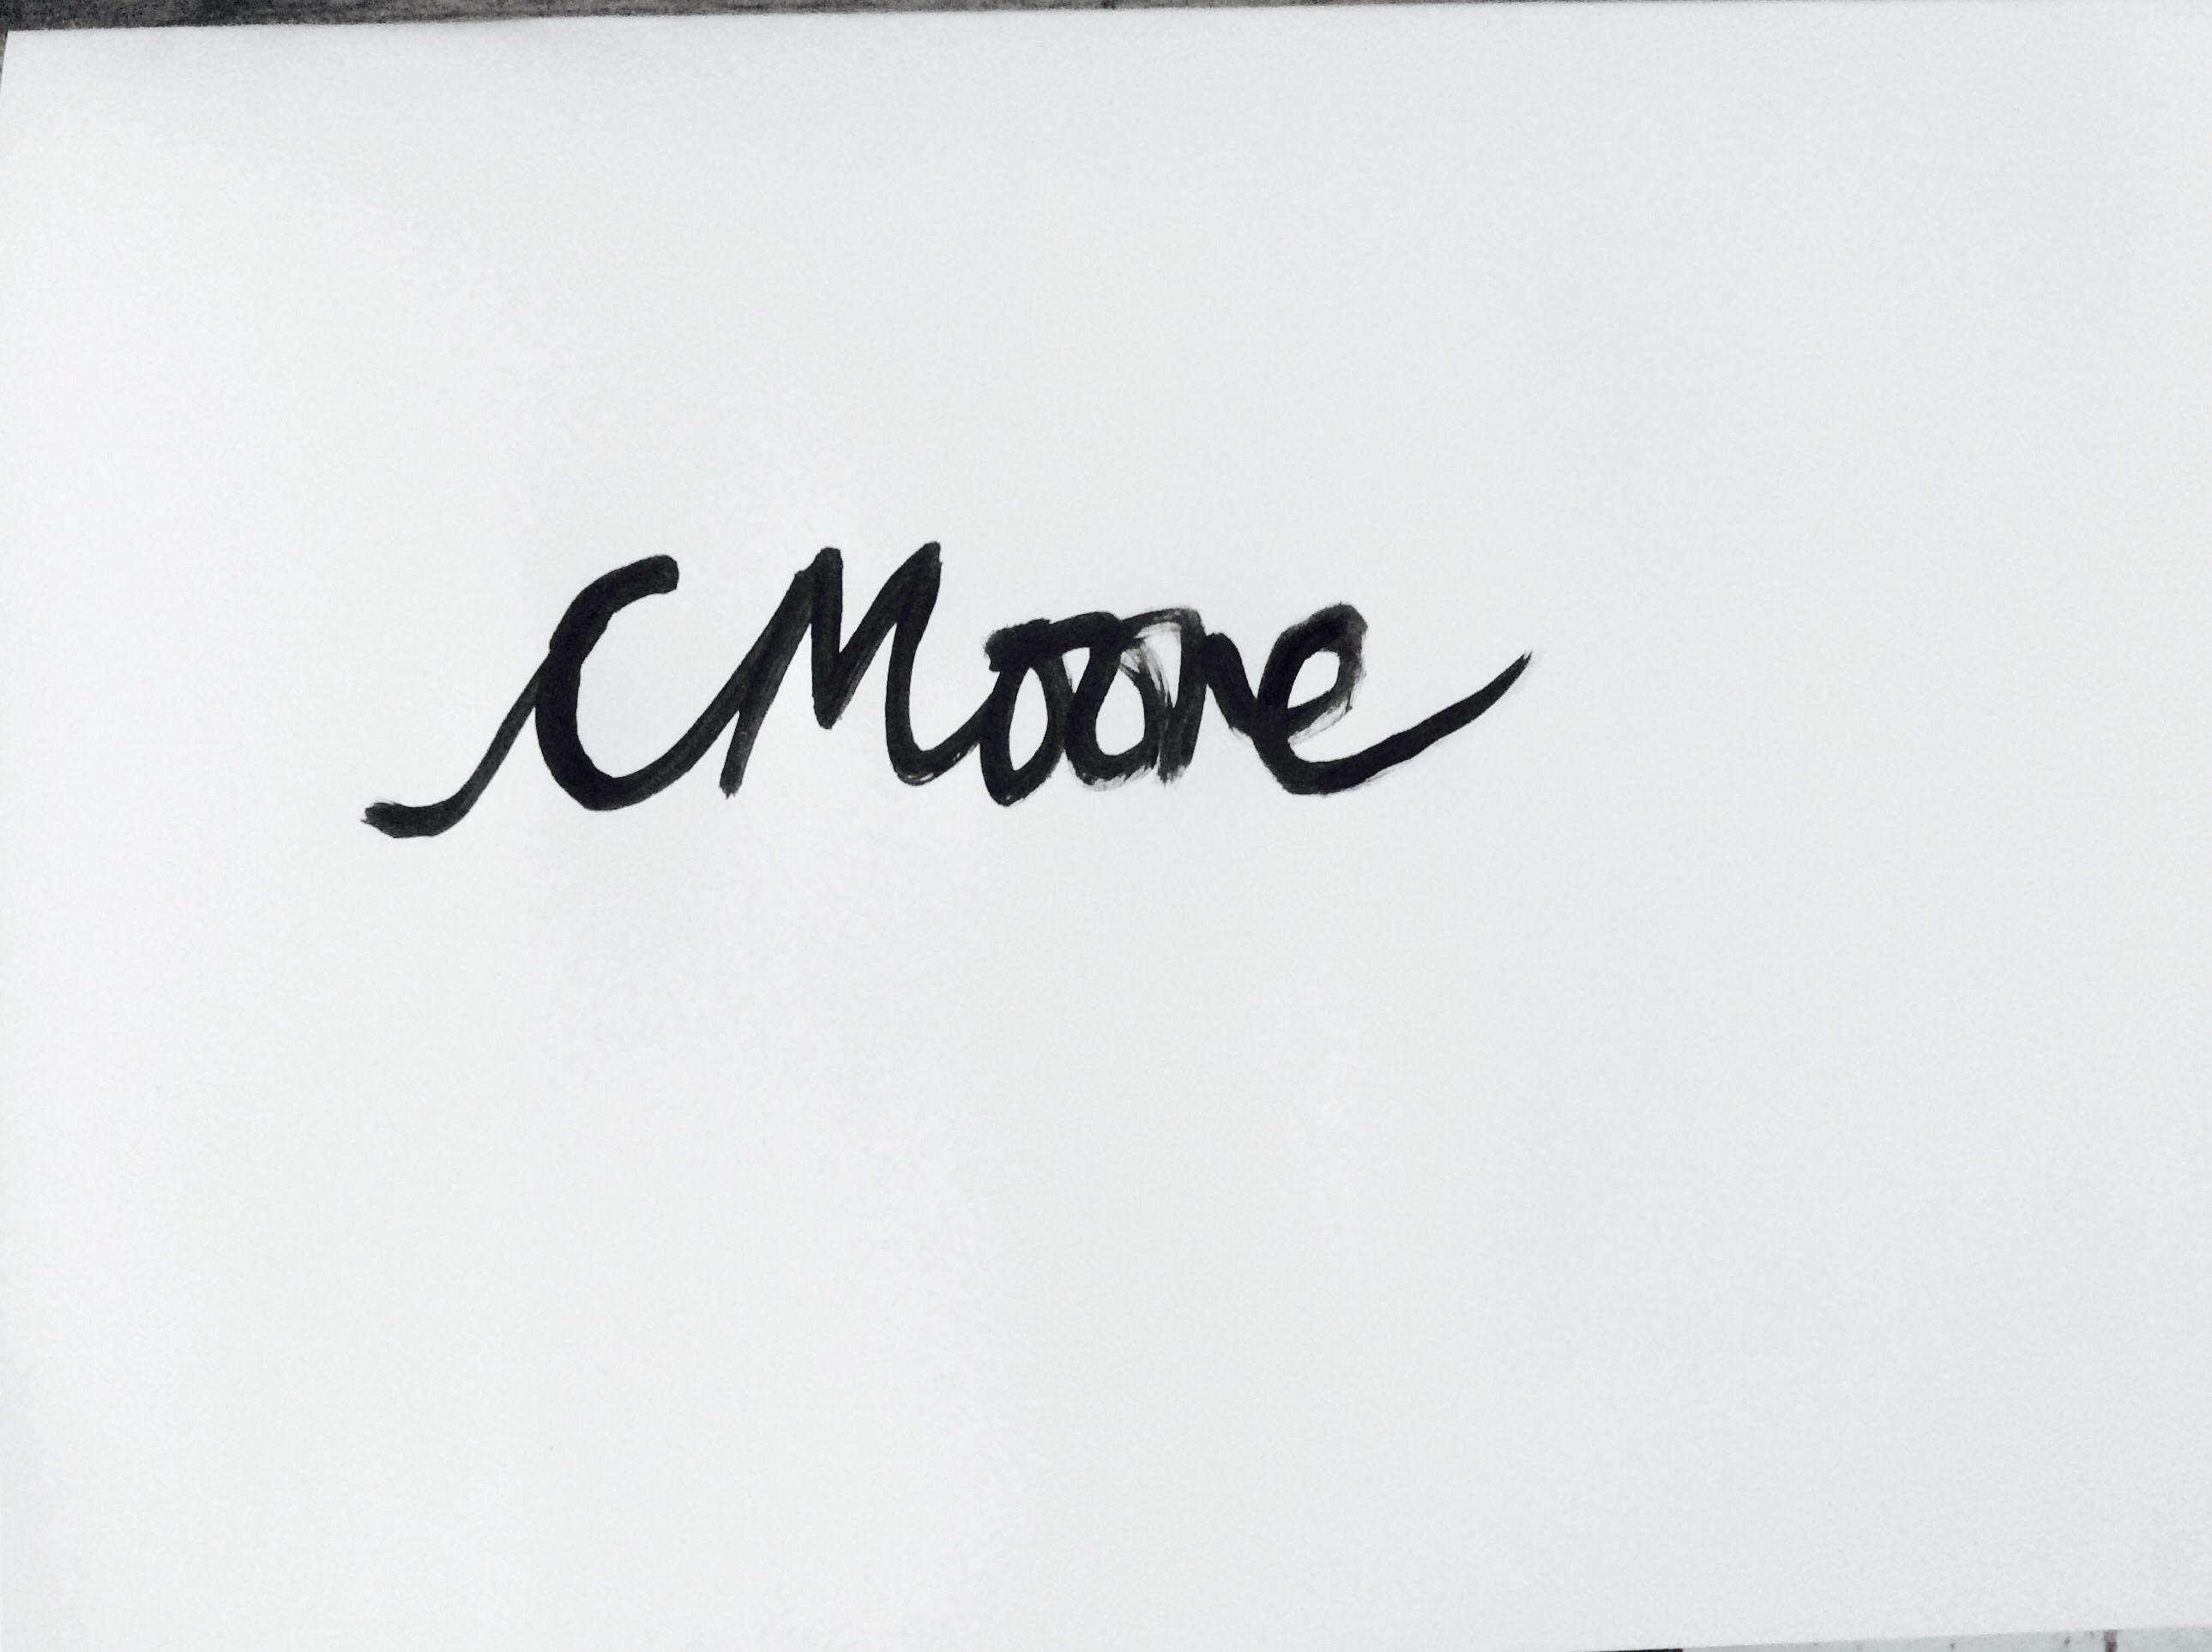 Charlotte Moore's Signature